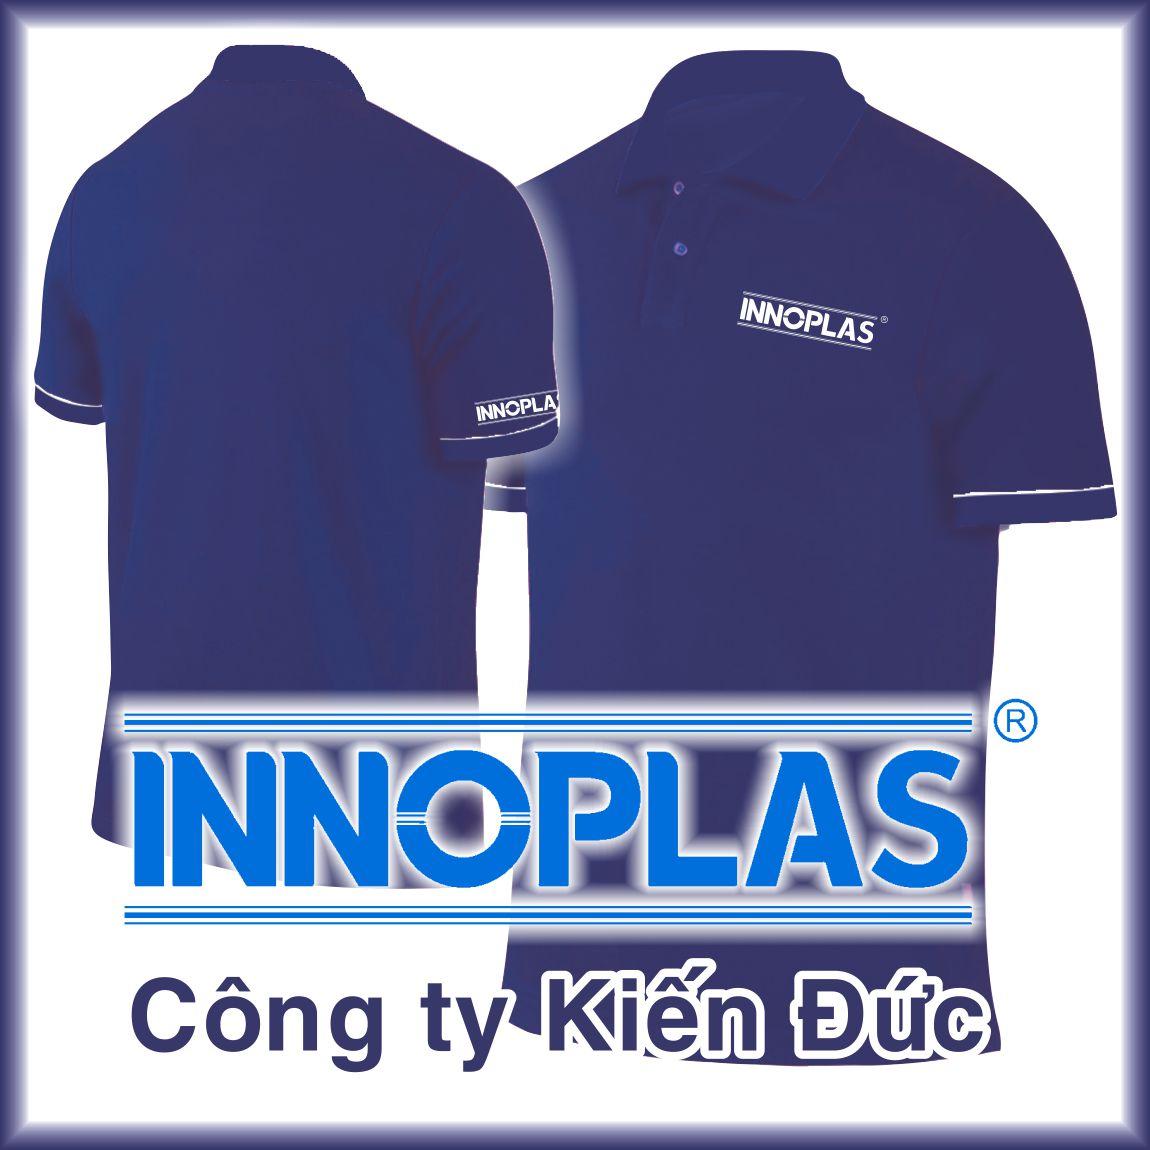 14.innoplas